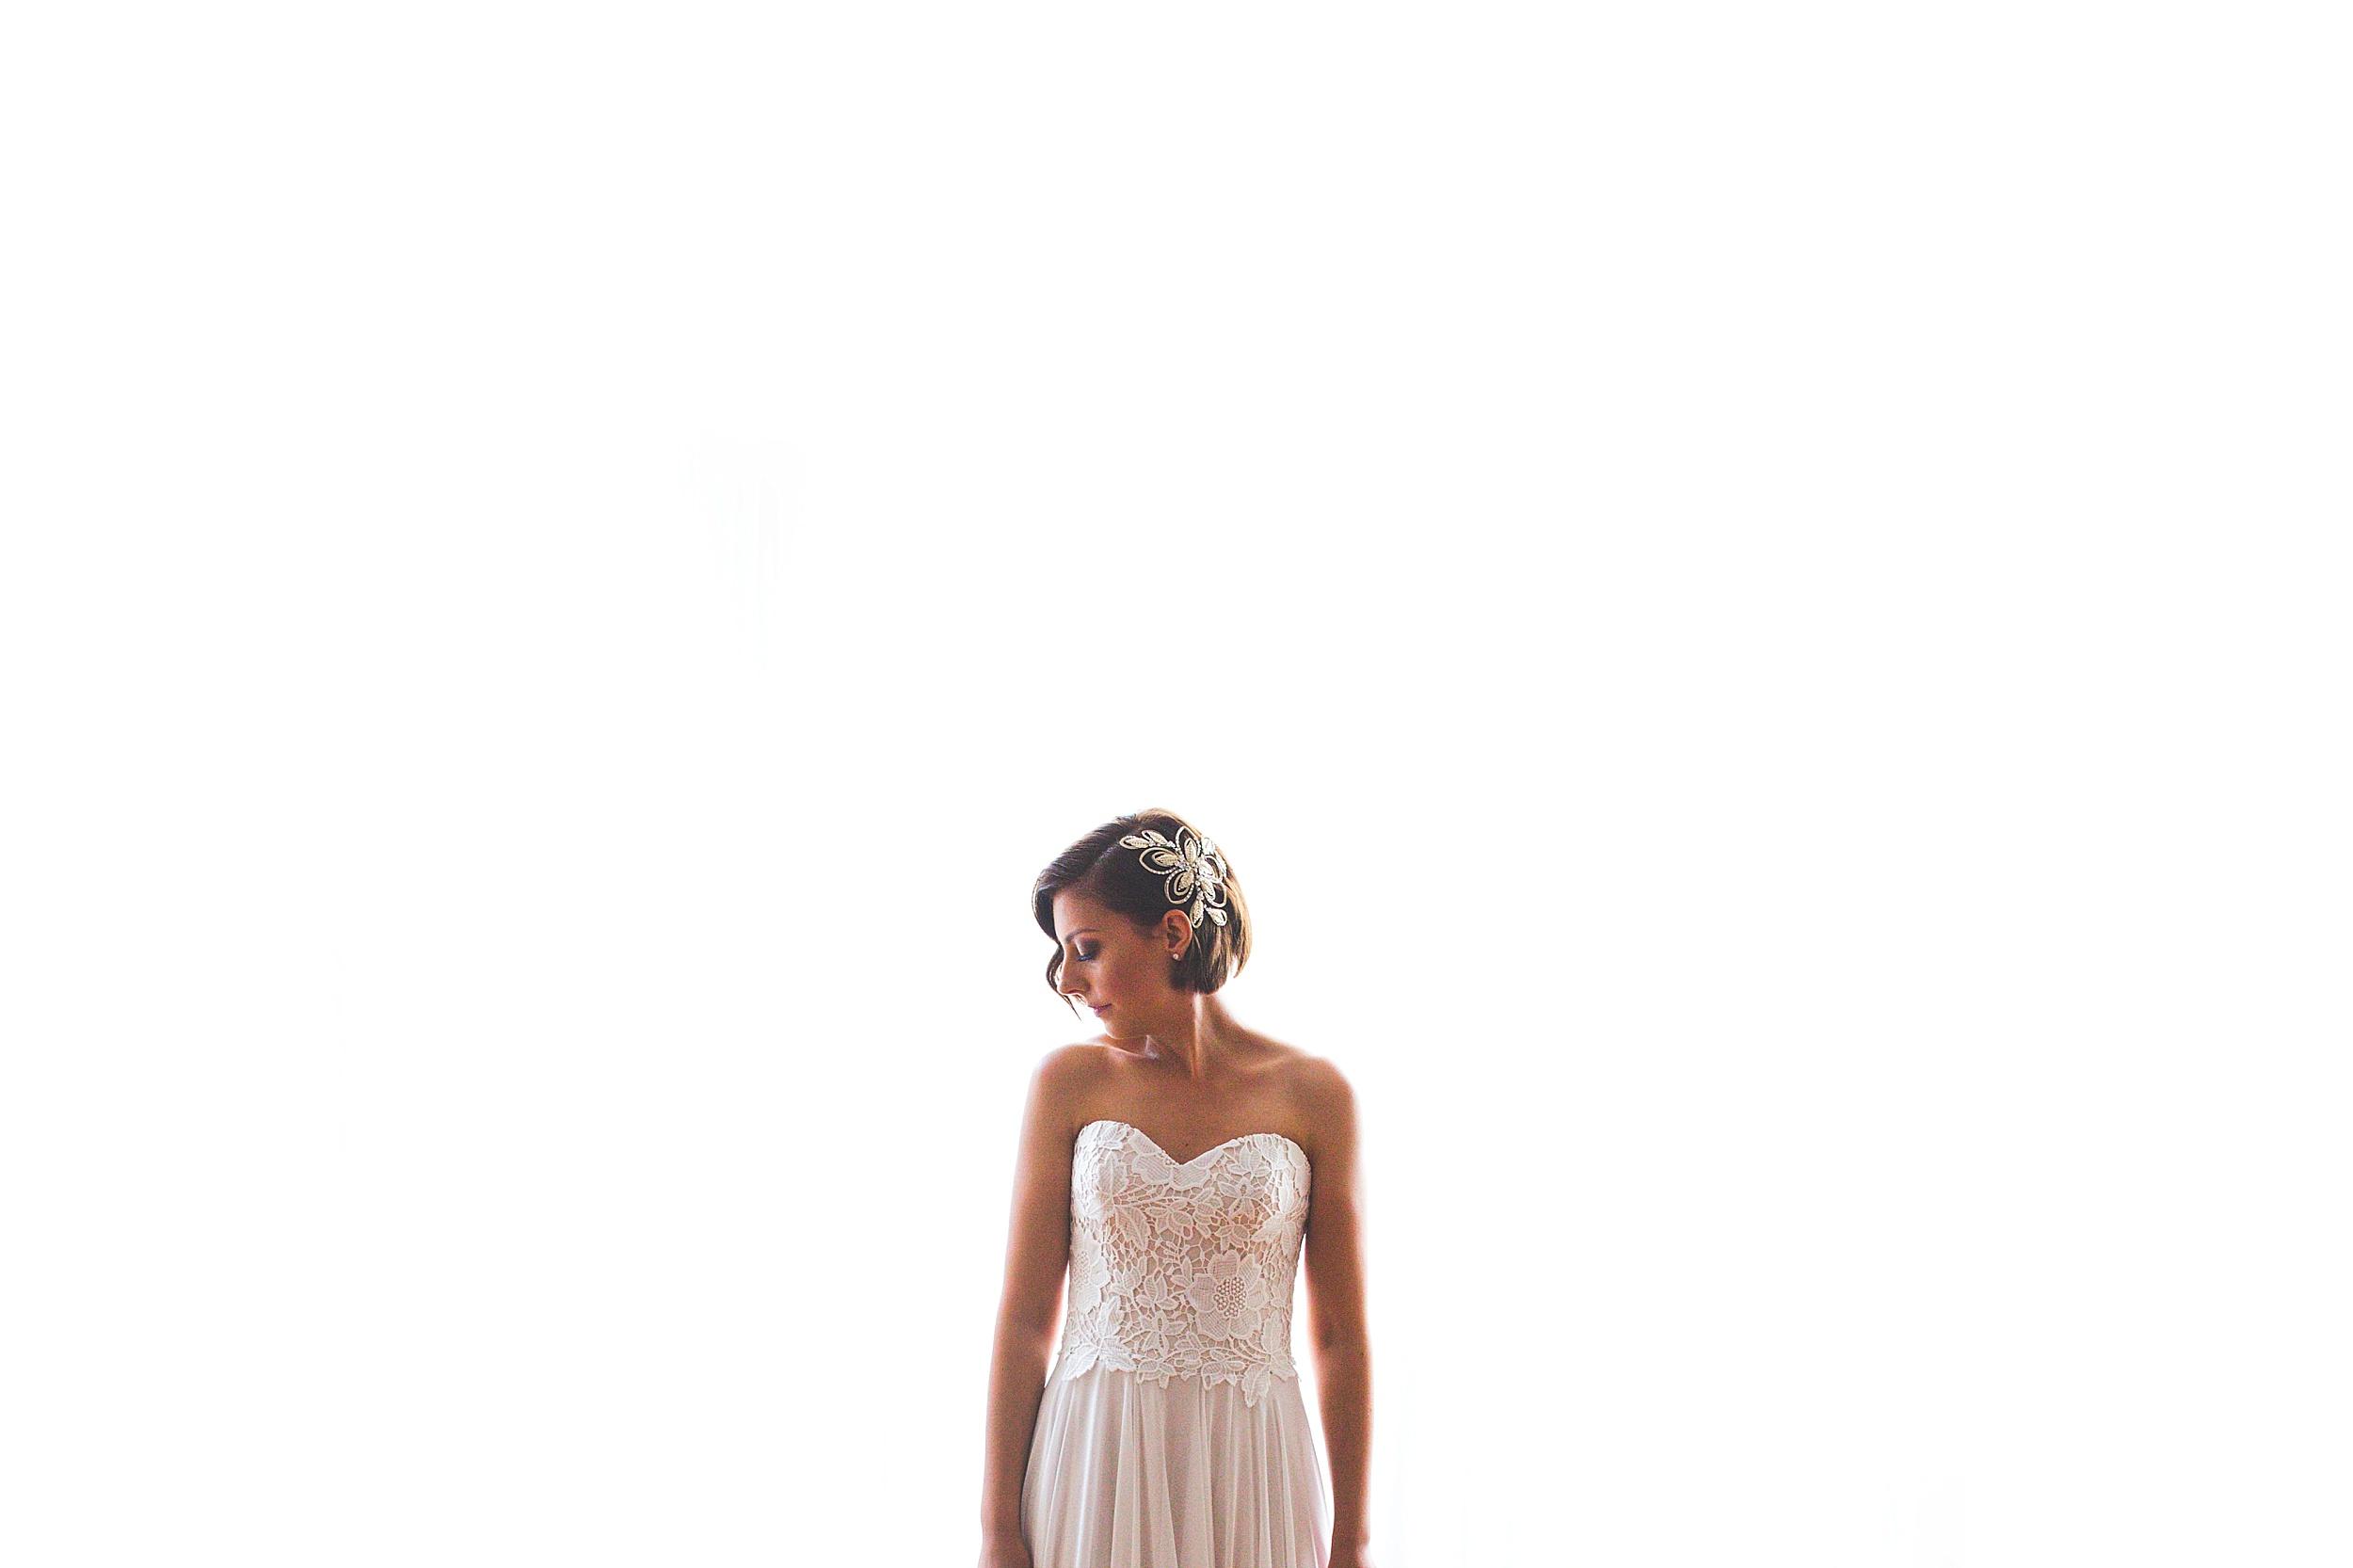 Adelaiade Wedding Photographer - pardon my french photography 69.jpg